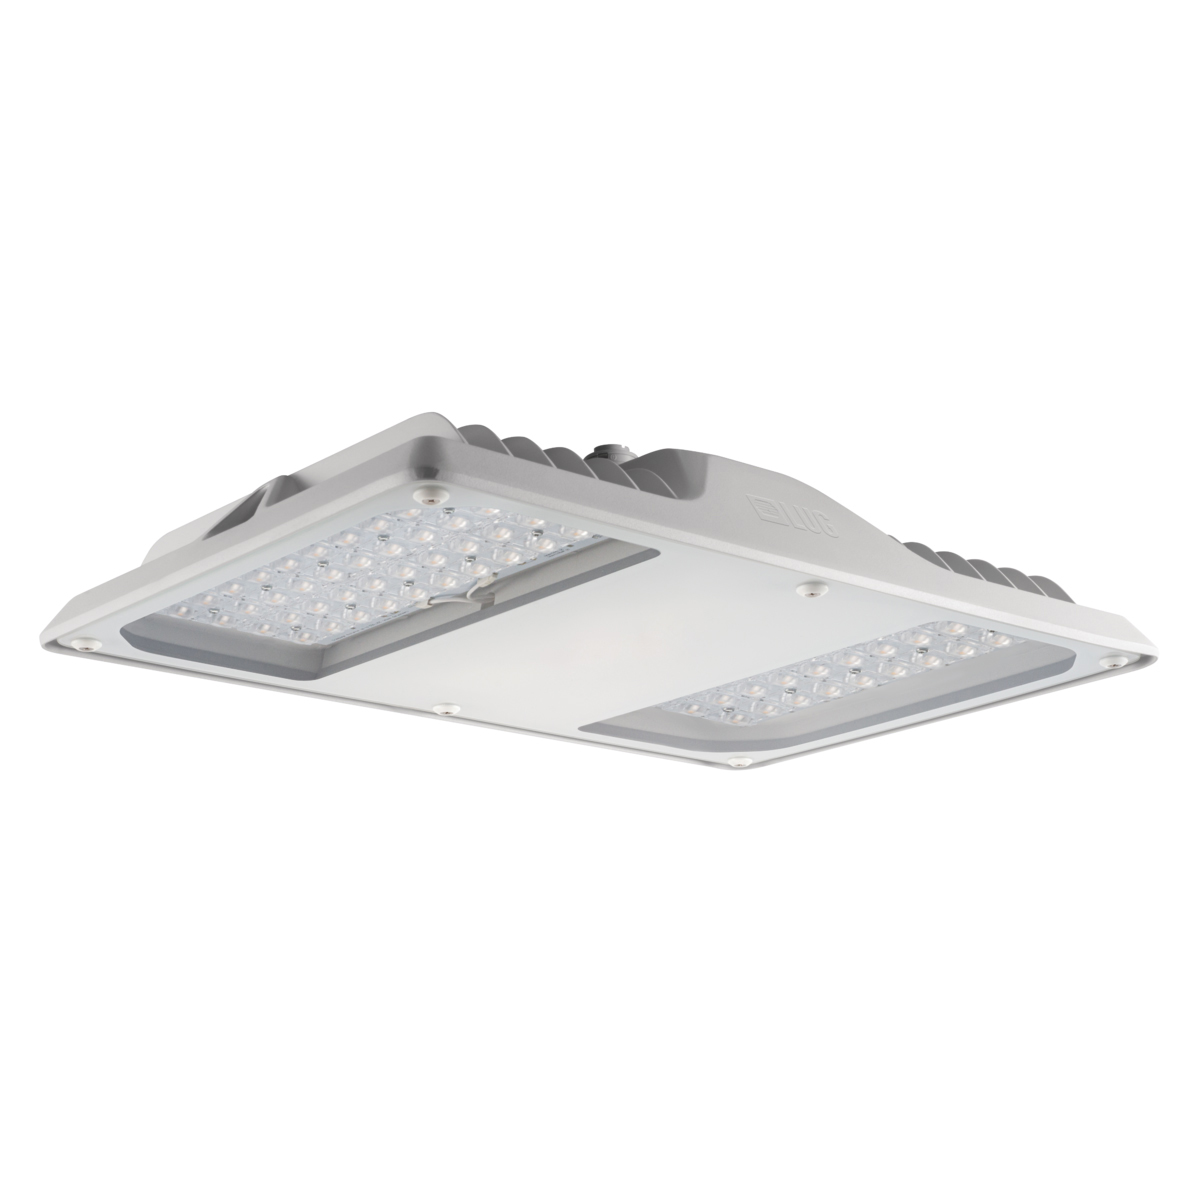 1 Stk Arktur Square LED 105W 11800lm/840 EVG IP65 55° grau LIG2501011